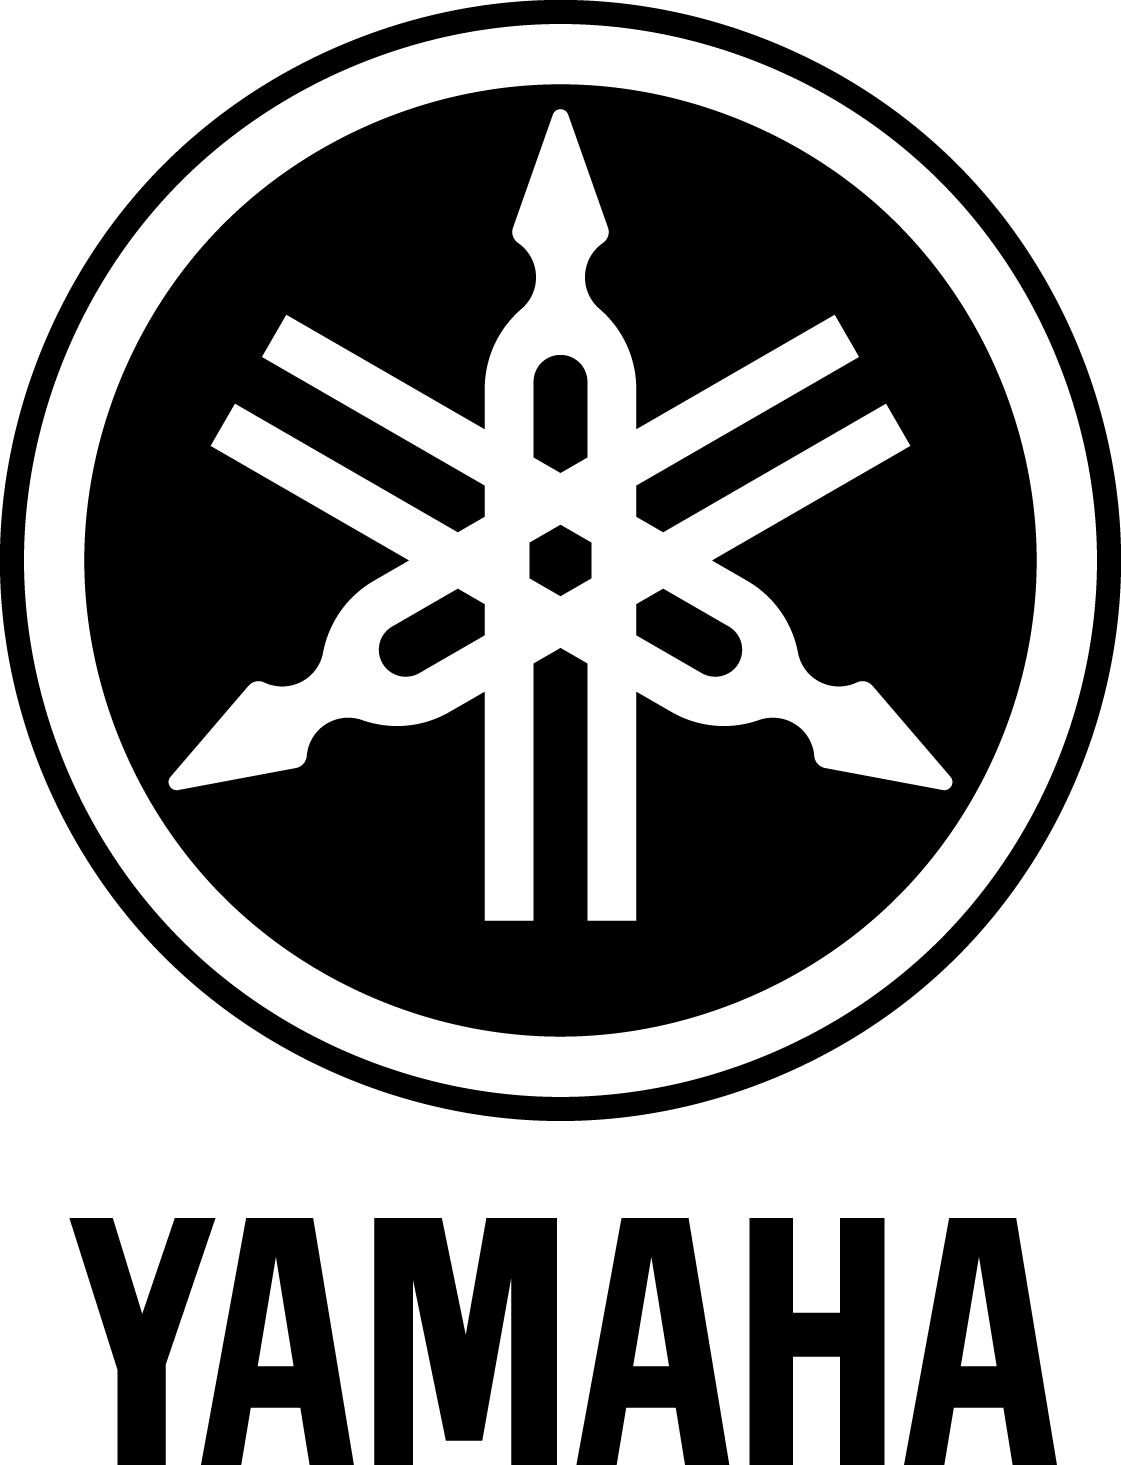 yamaha logo [ 1121 x 1465 Pixel ]